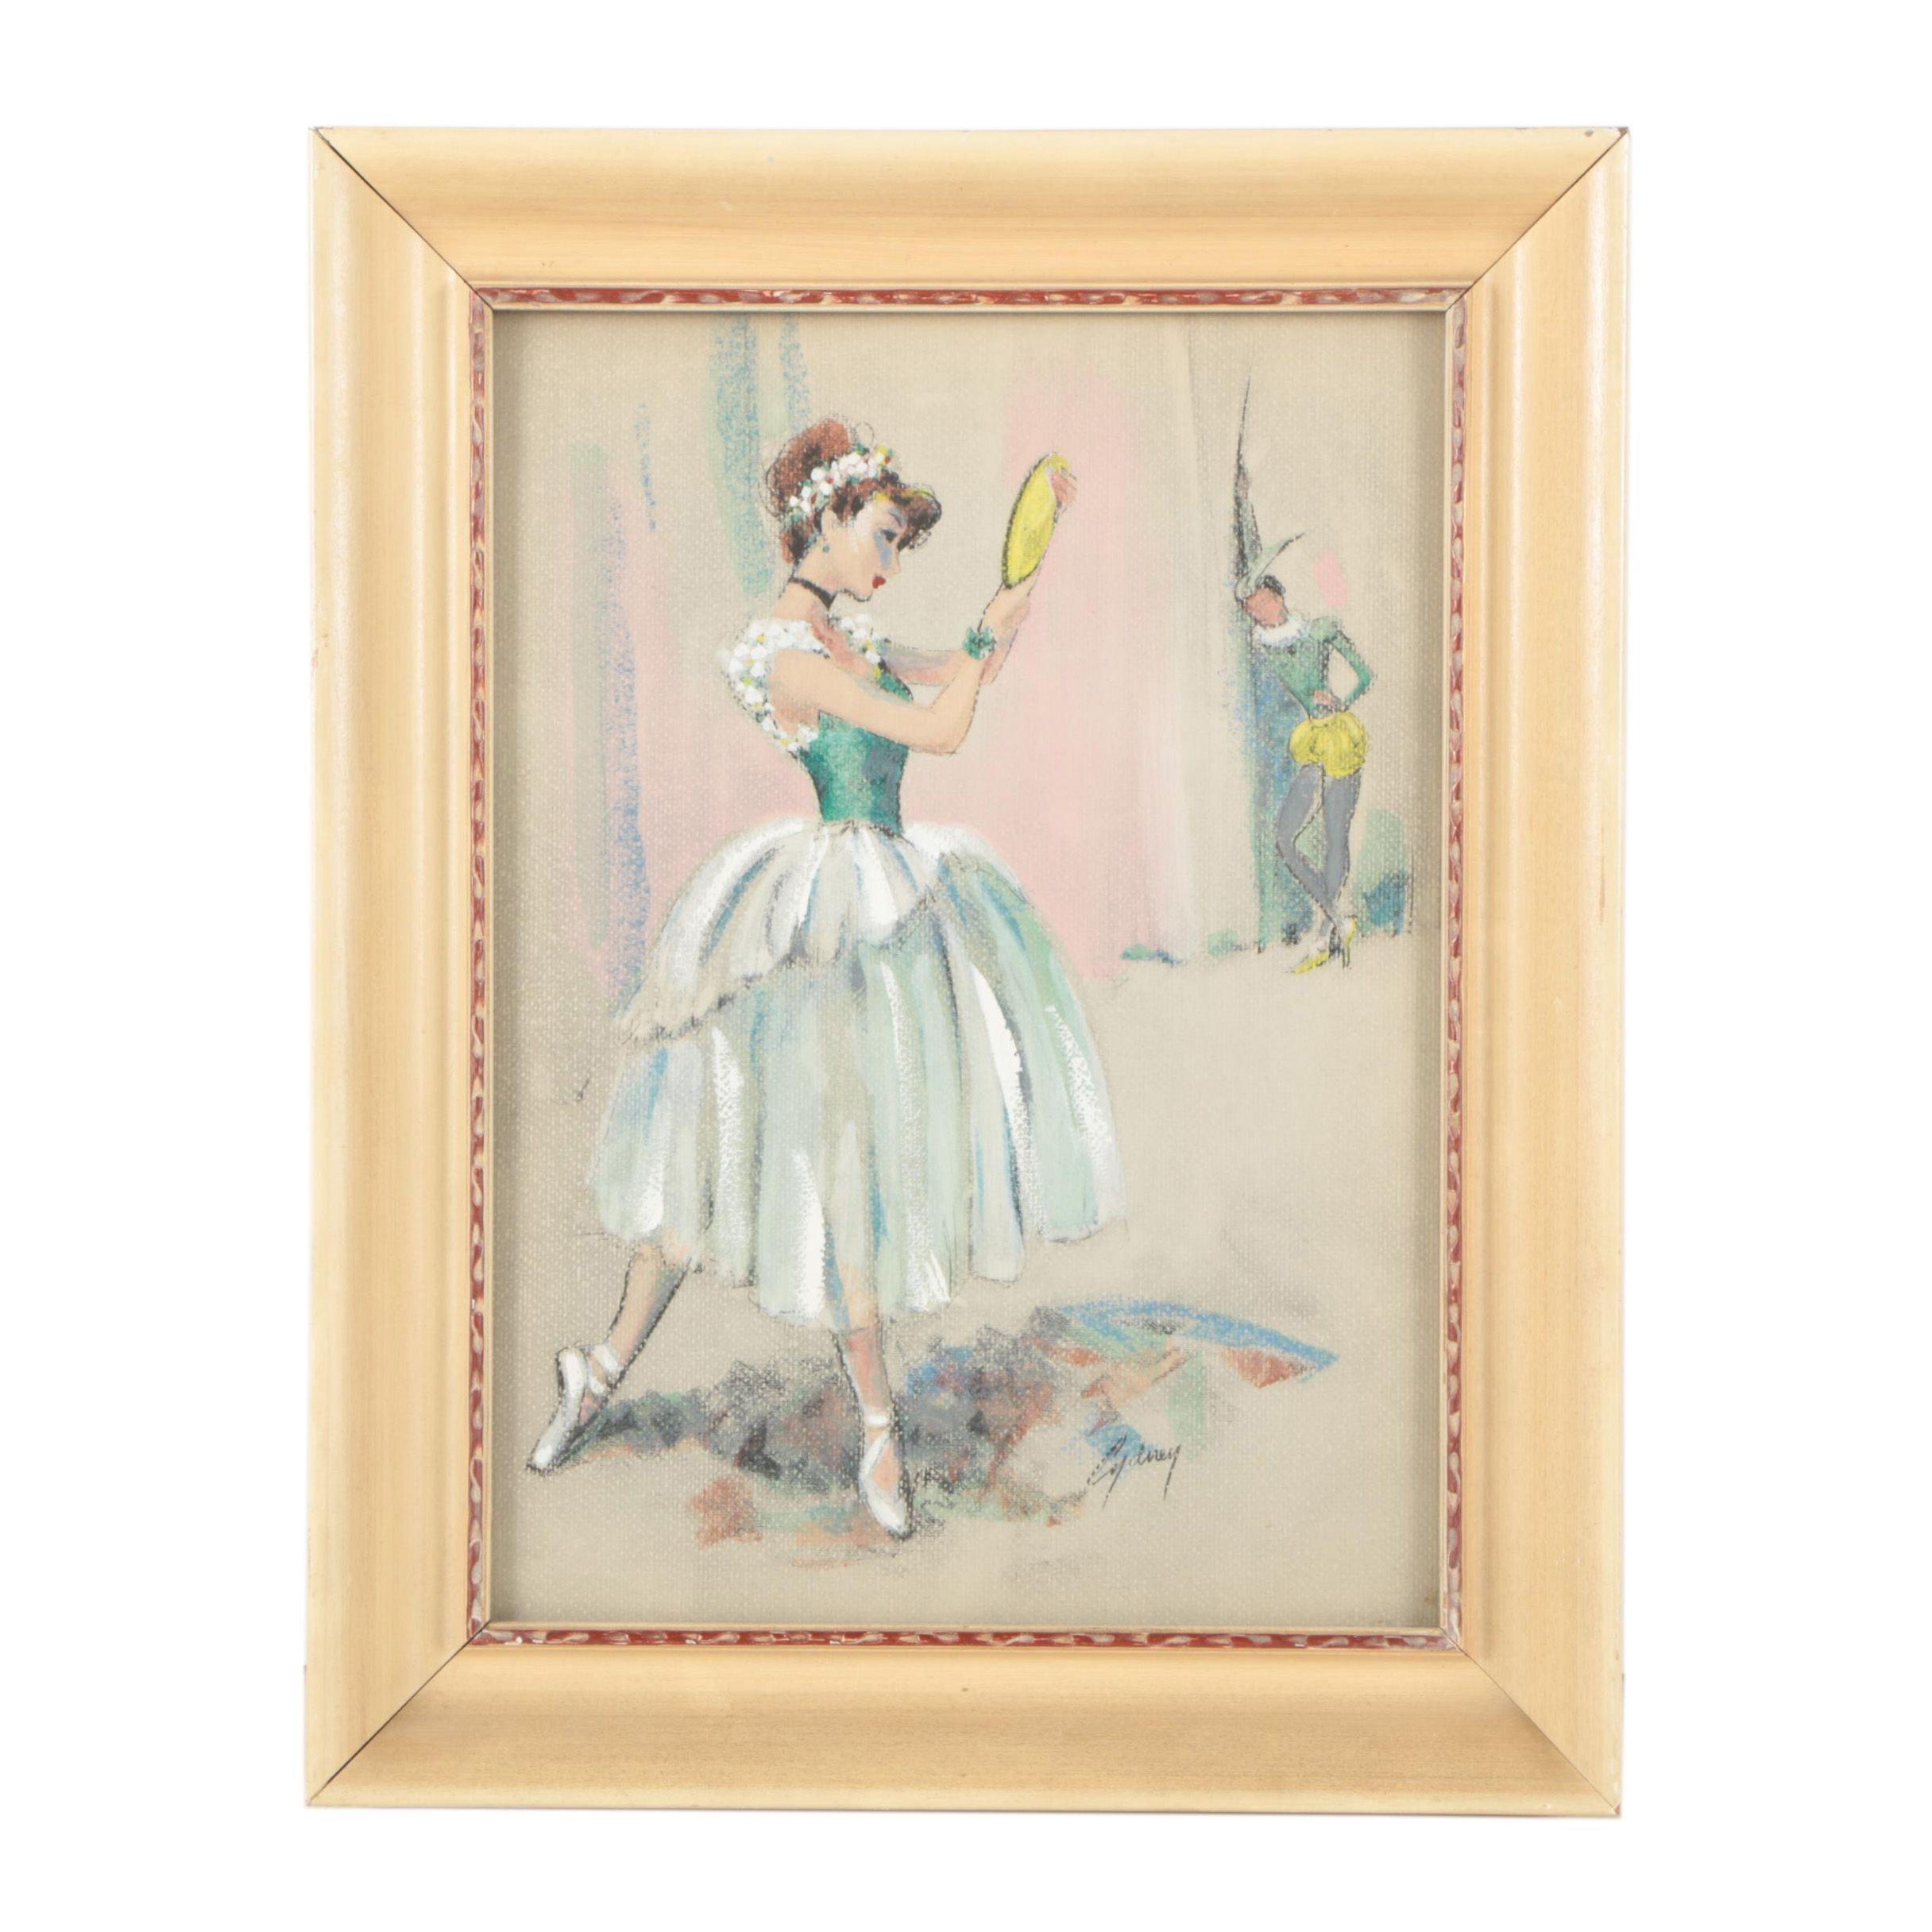 Cydney Grossman Mid Century Gouache Painting of Ballerina